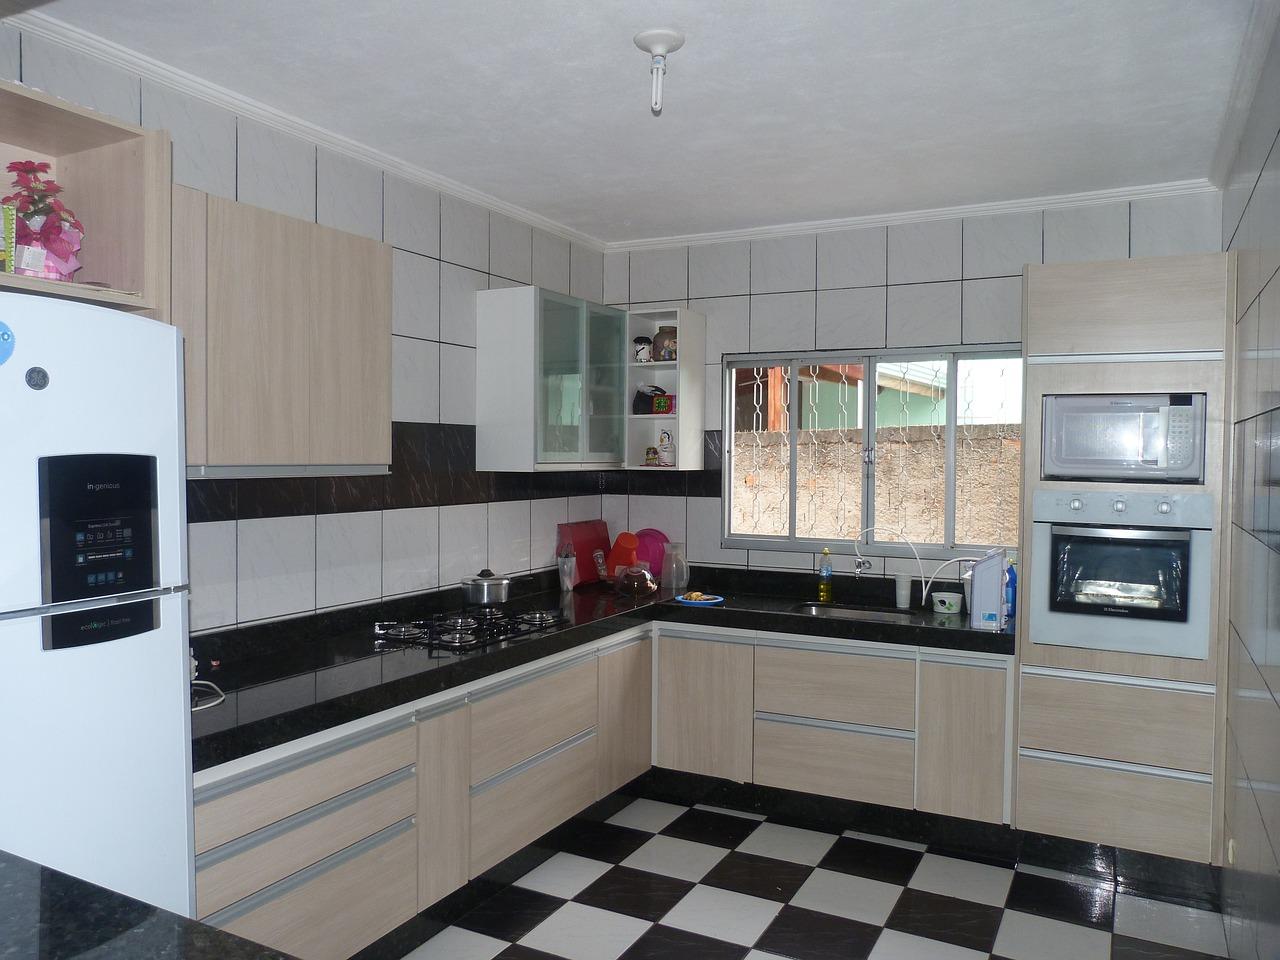 Feng Shui Küche & Küchenplanung: Was ist zu beachten?